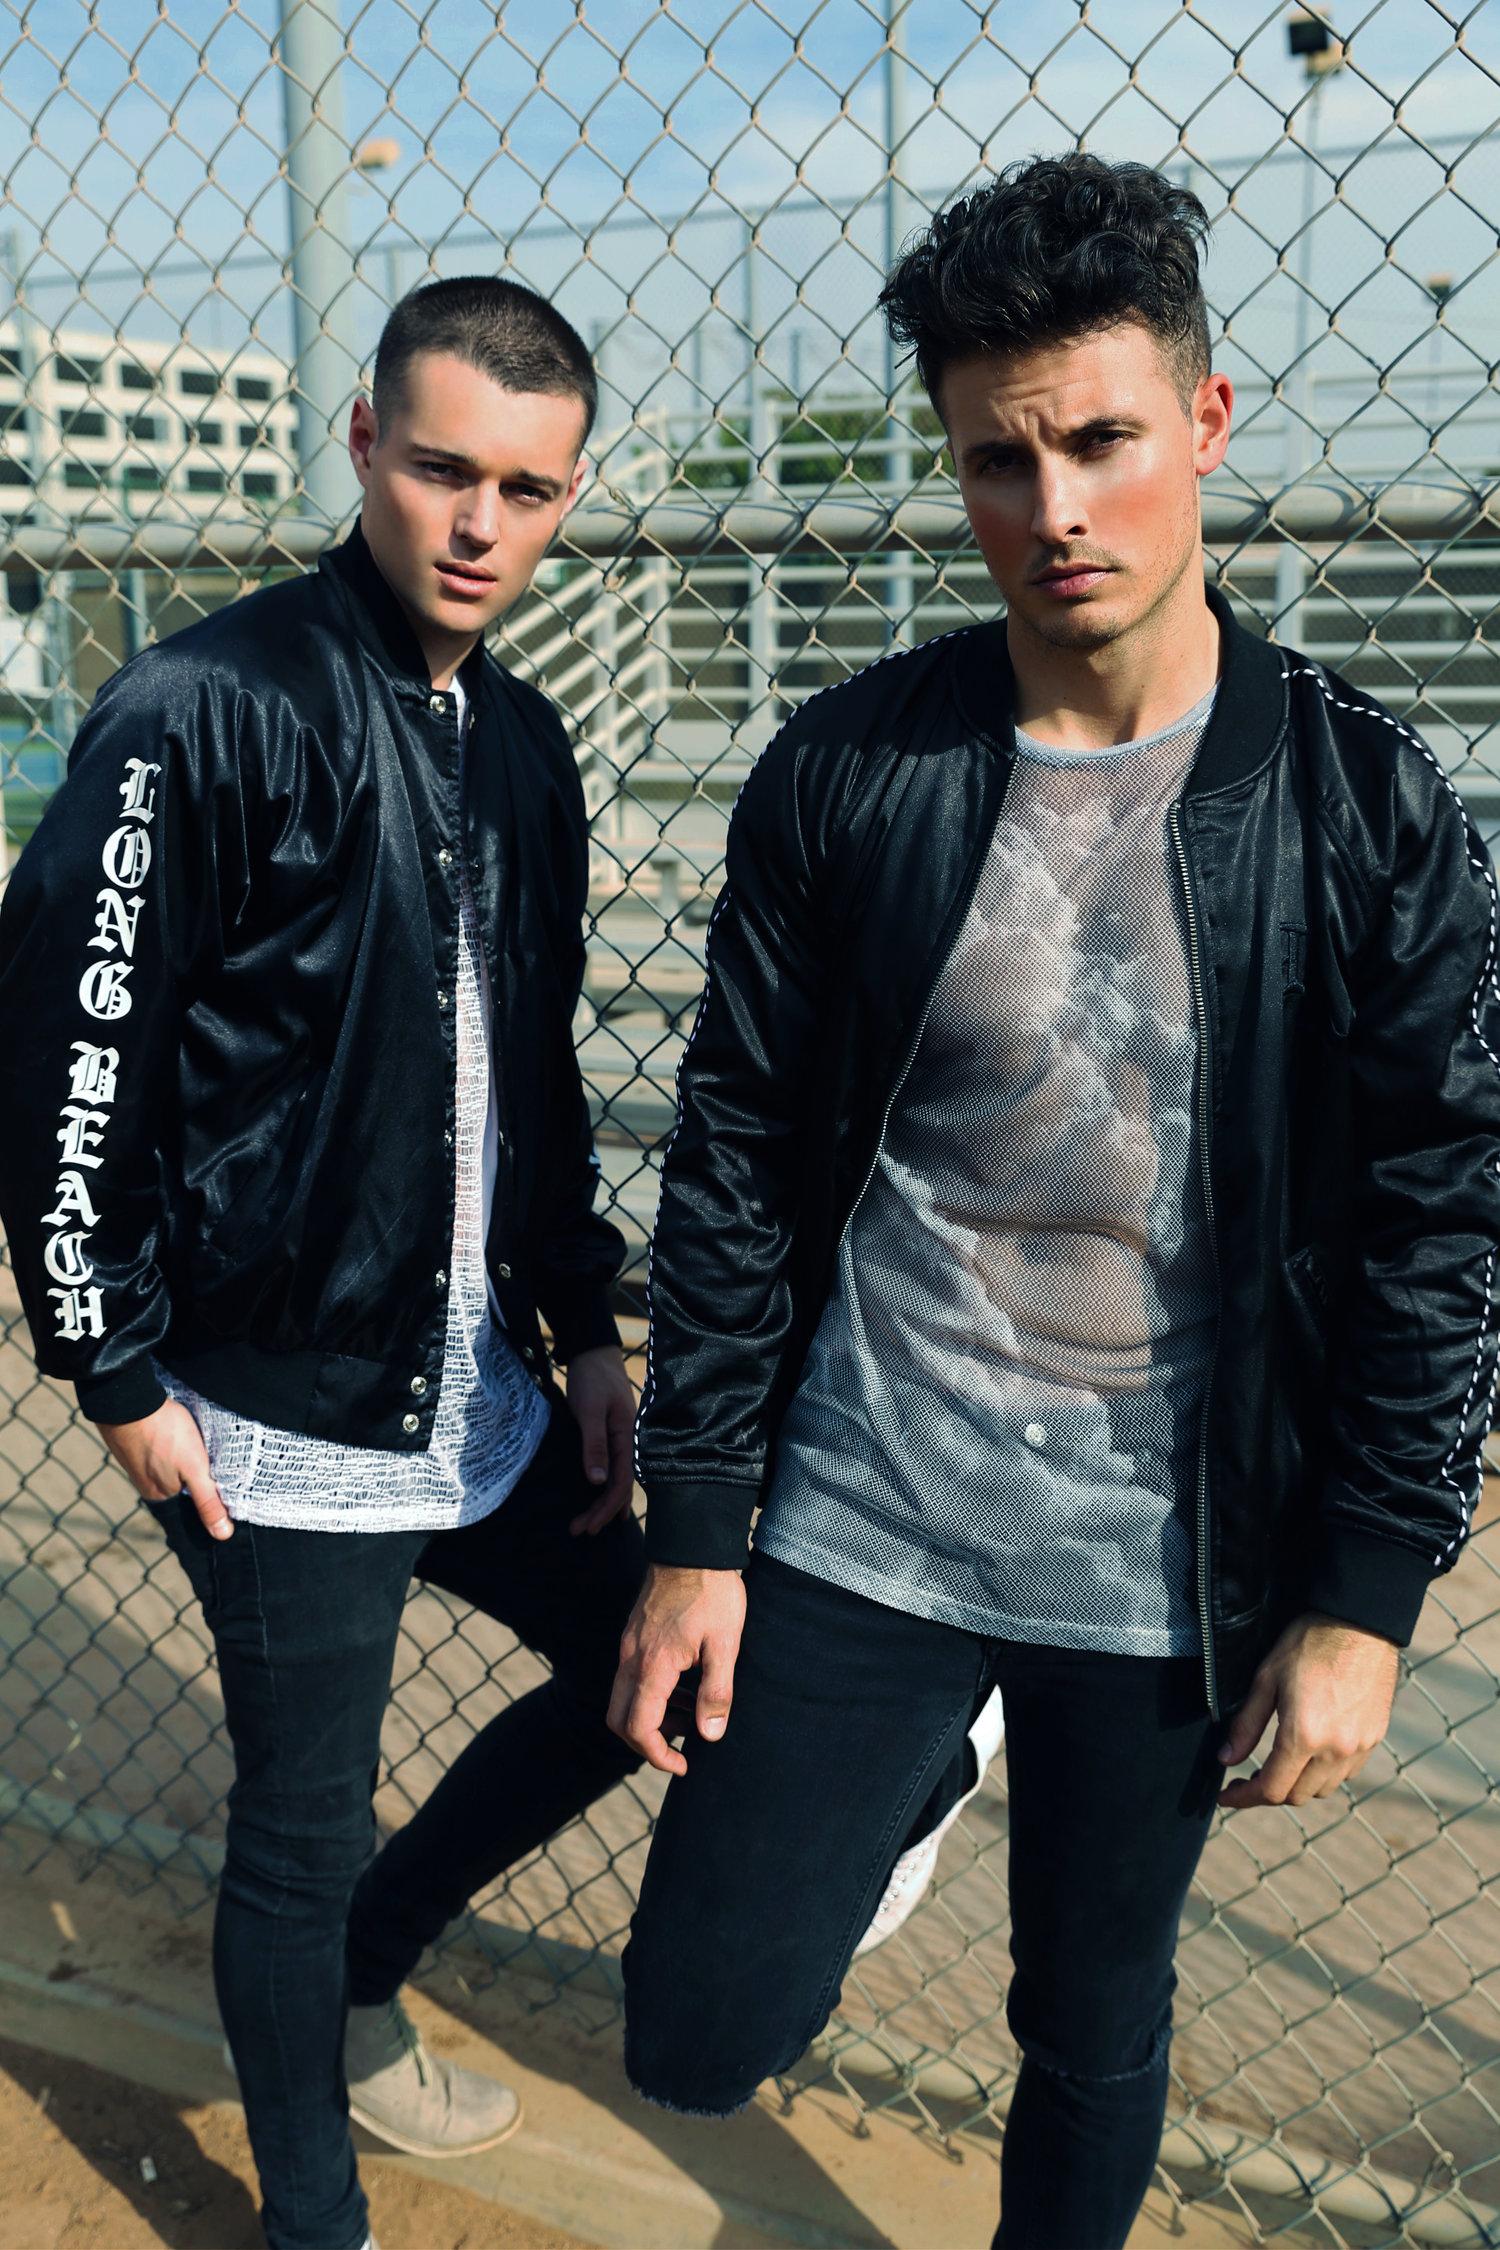 Adon Exclusive: Models Kyle Sarine and Jake mast  By Logan Noh